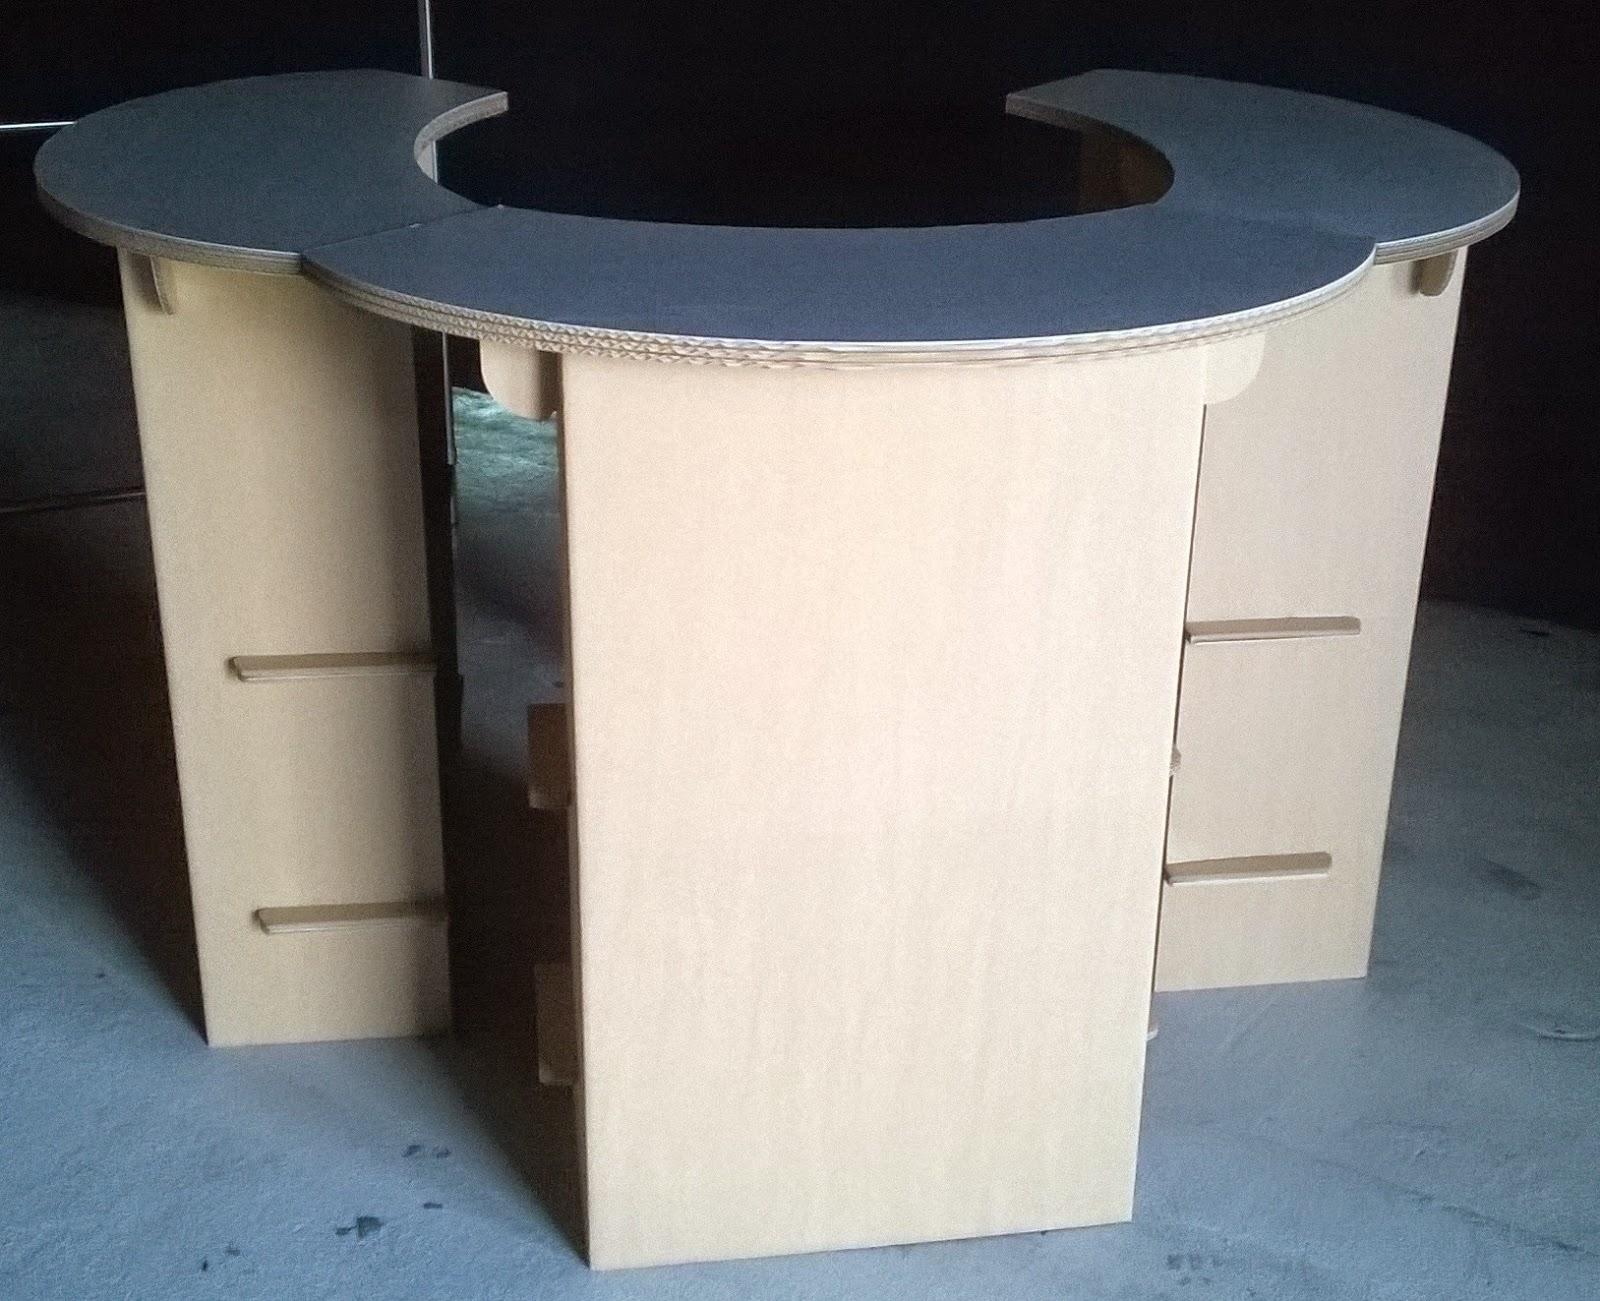 carton kit cr ations objets et meubles 100 carton mobilier carton. Black Bedroom Furniture Sets. Home Design Ideas